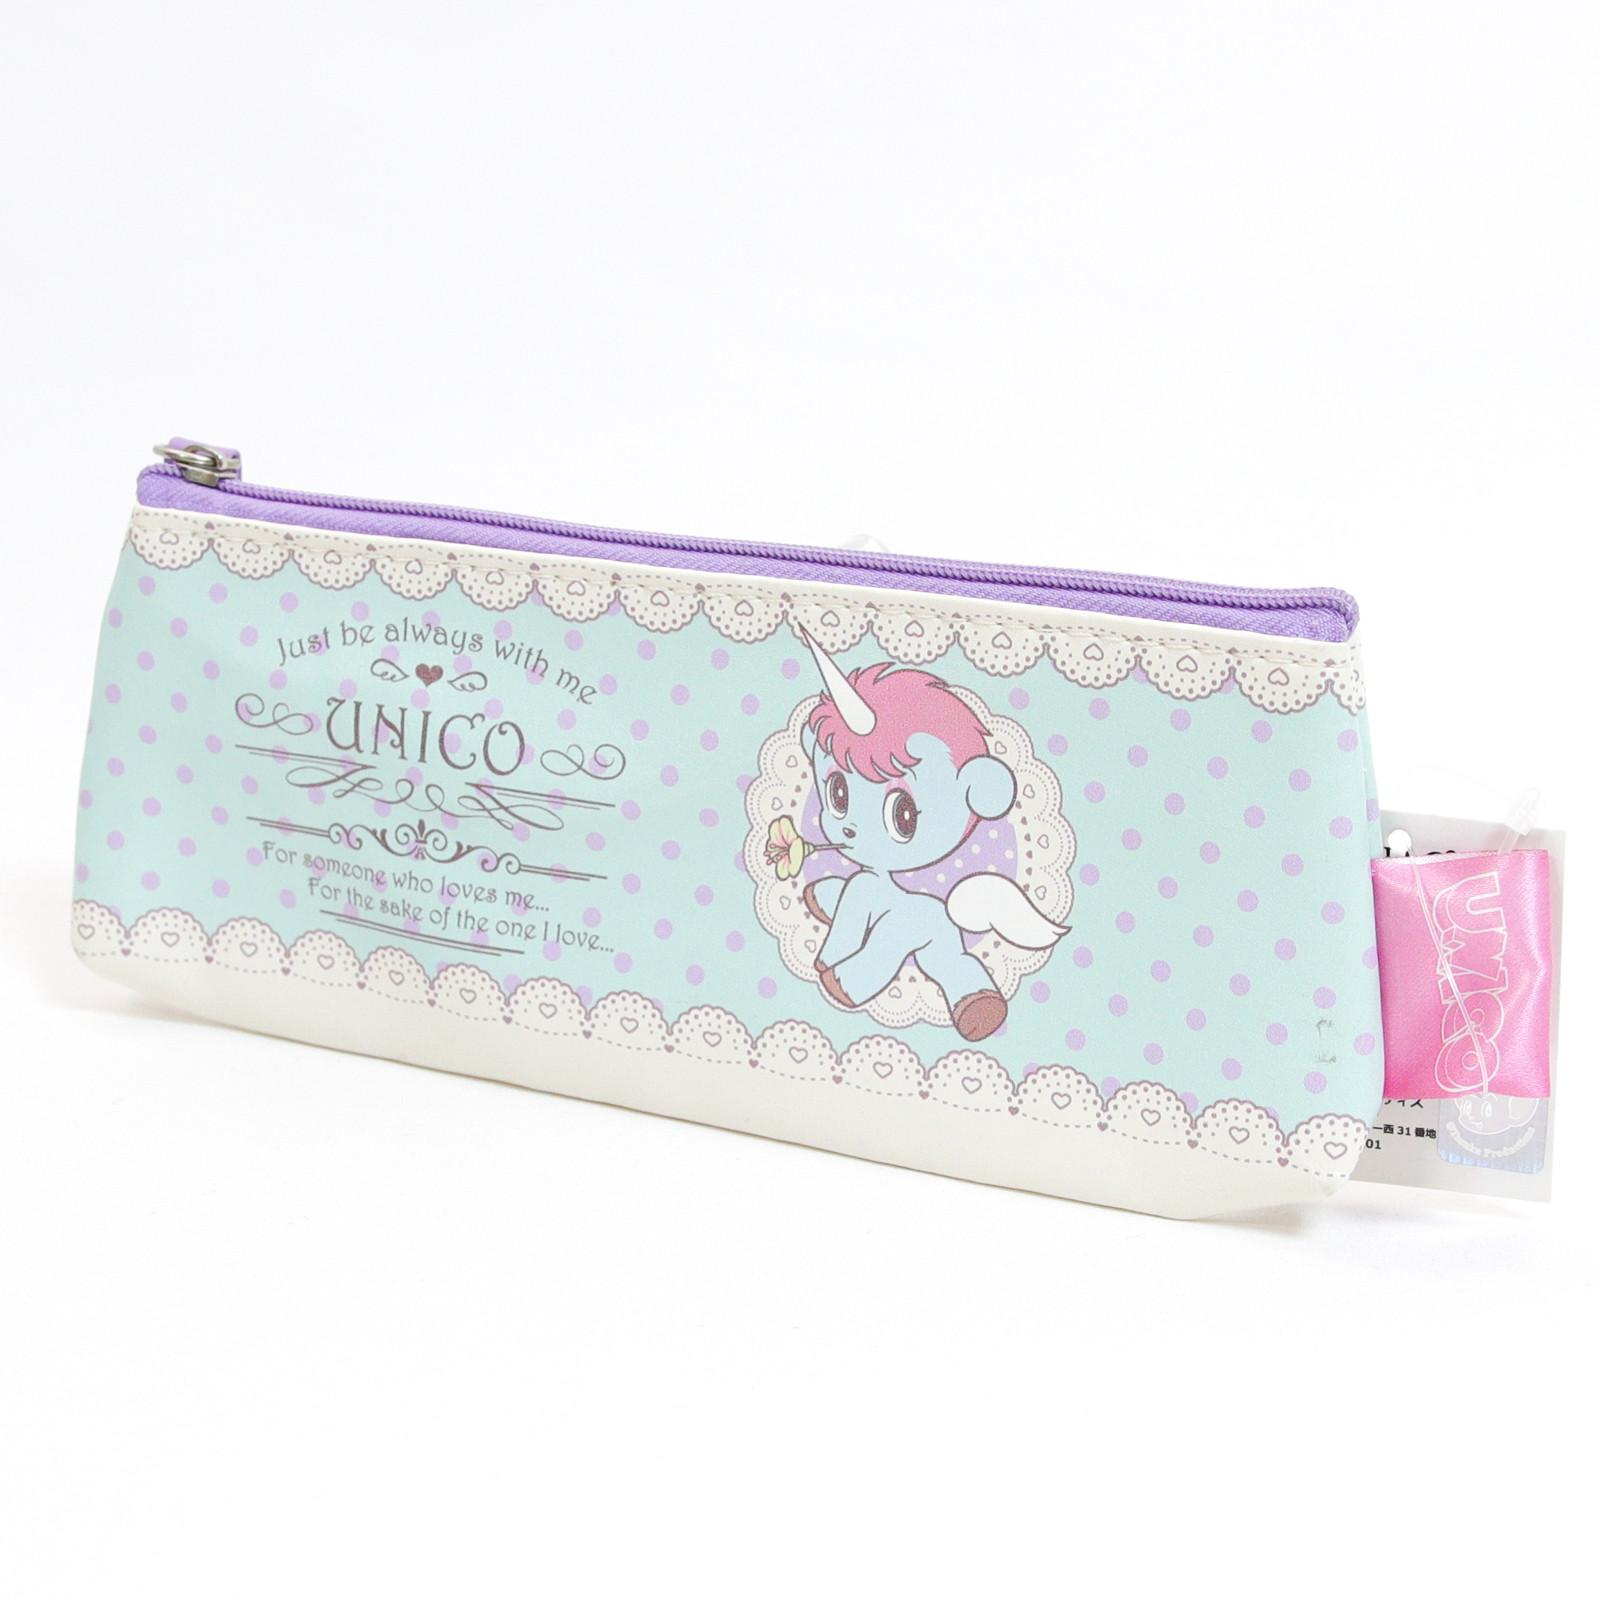 UNICO Soft Pen Case #1 Tezuka Osamu JAPAN ANIME